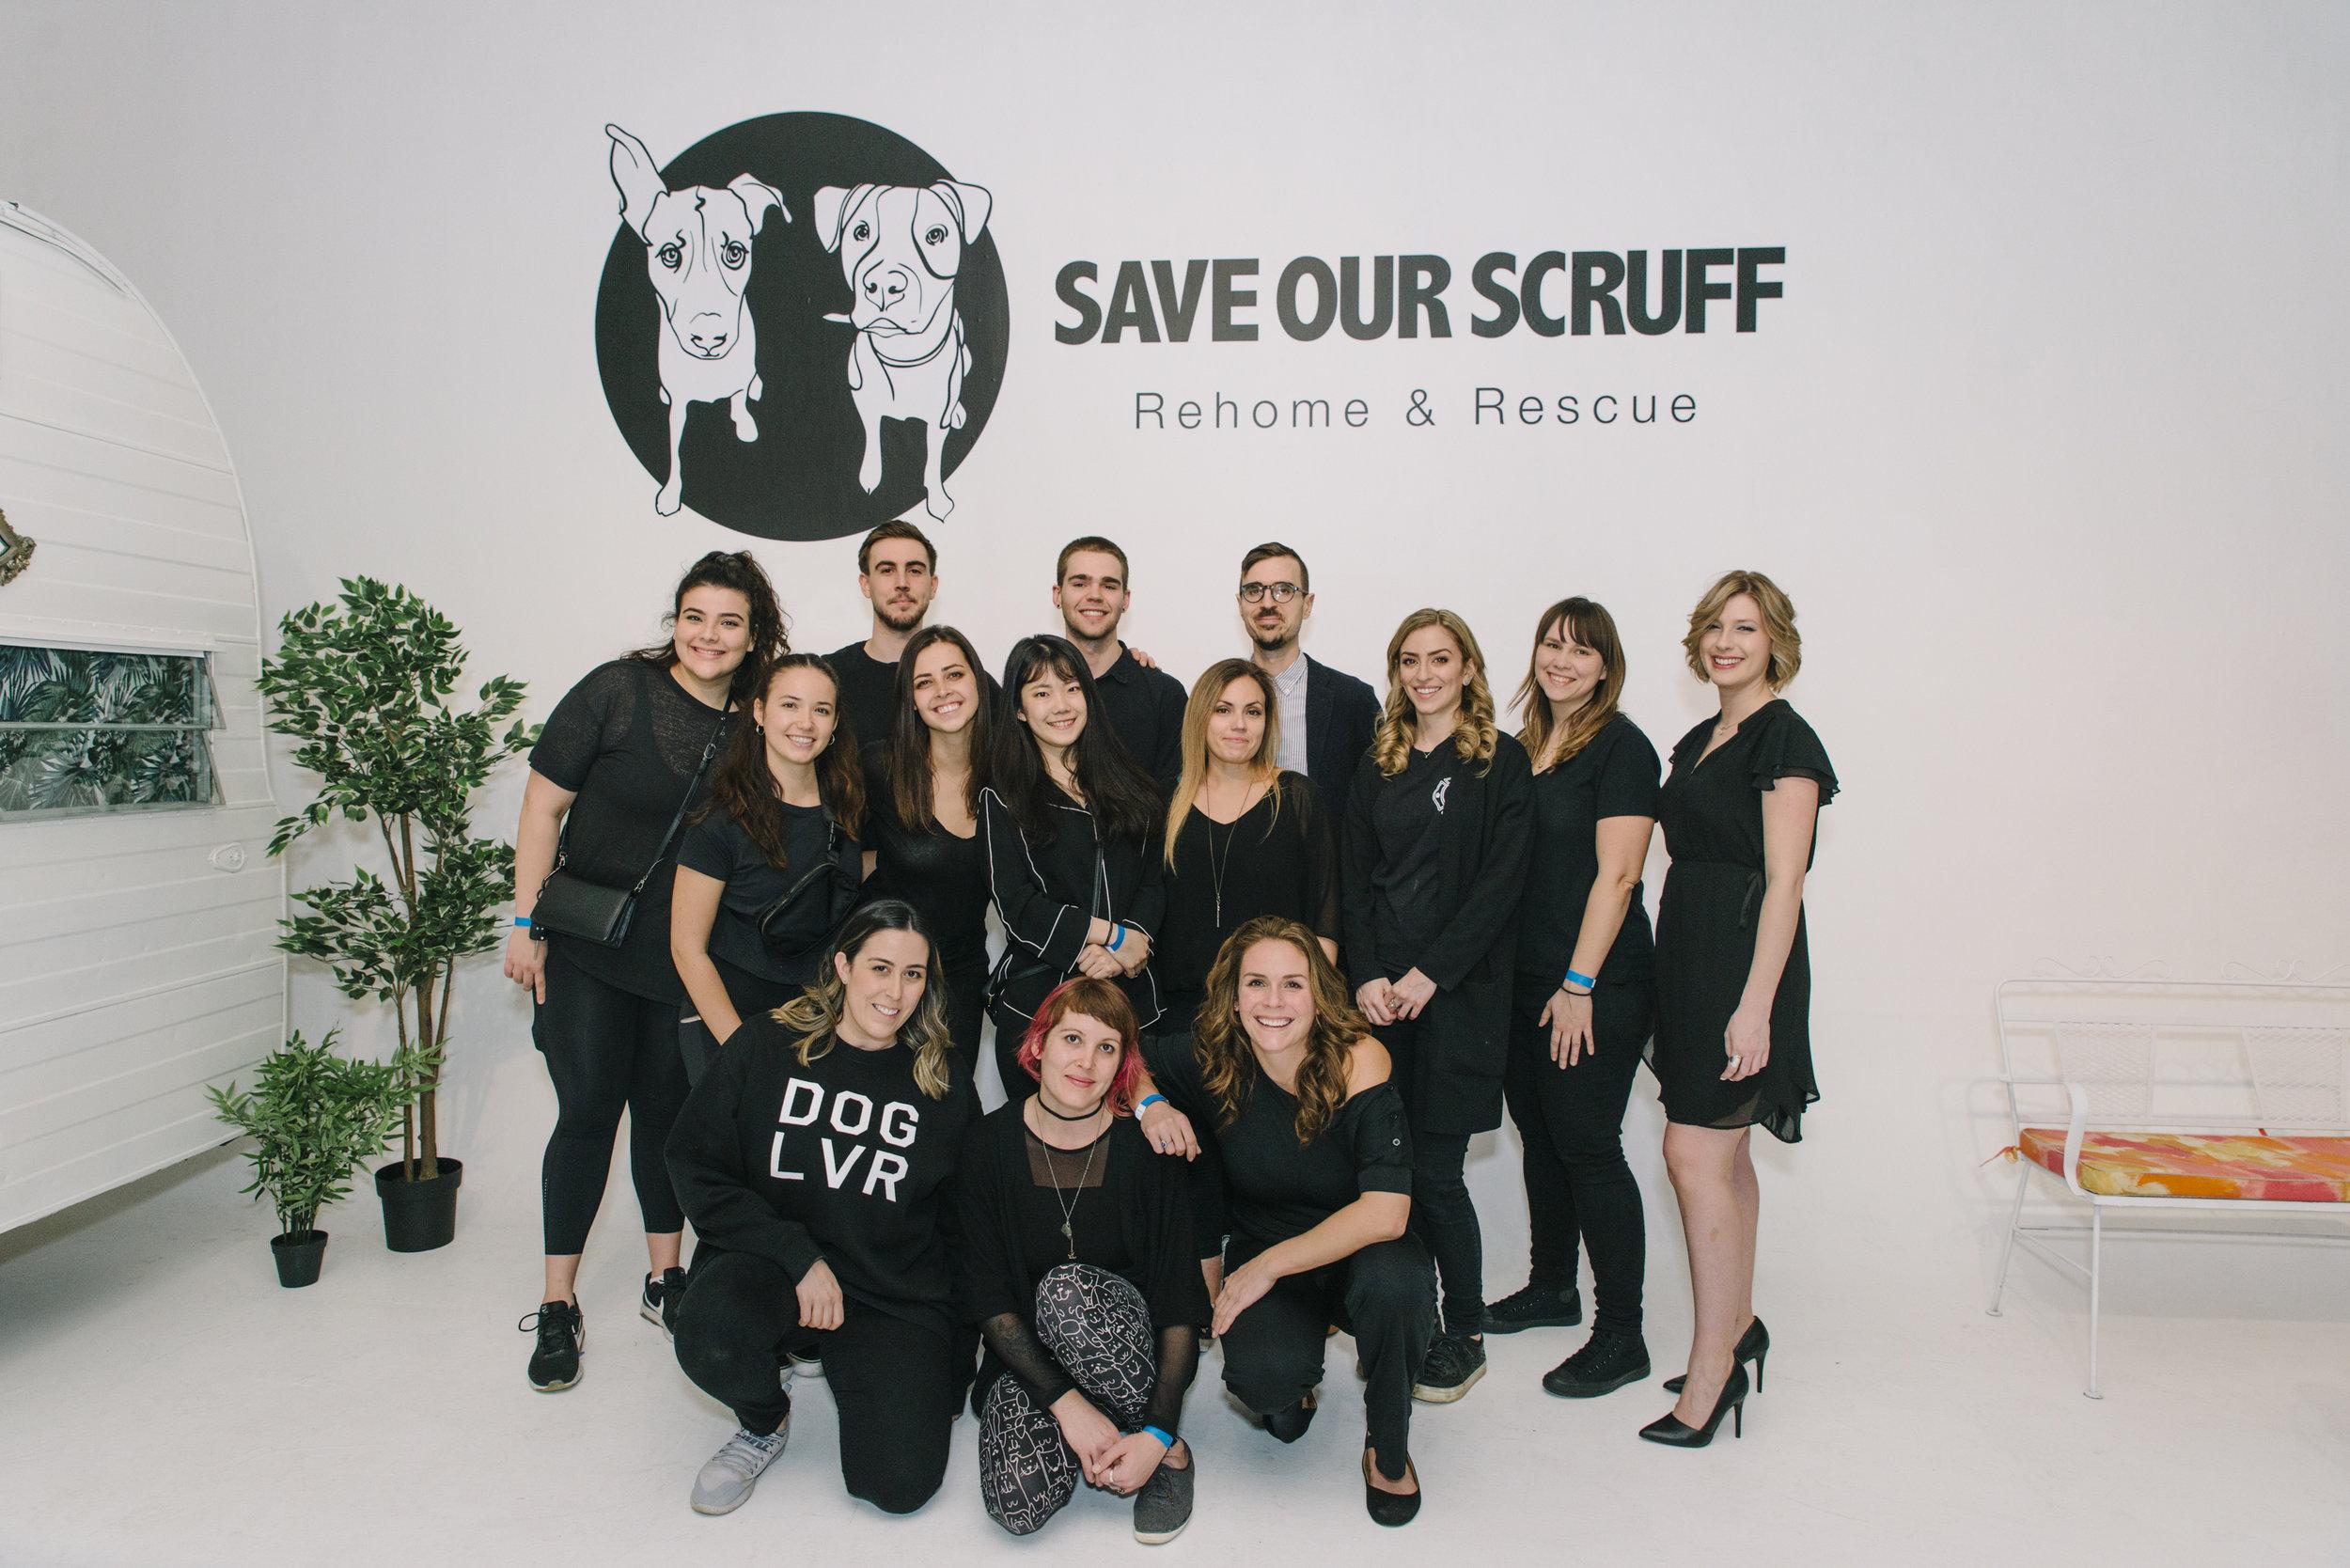 StefEthan-SaveOurScruff-ScruffSocal-SOS-DogRescue-District28Events-D28-TorontoEventPhotographer-Event-SOSDogRescue-12.JPG